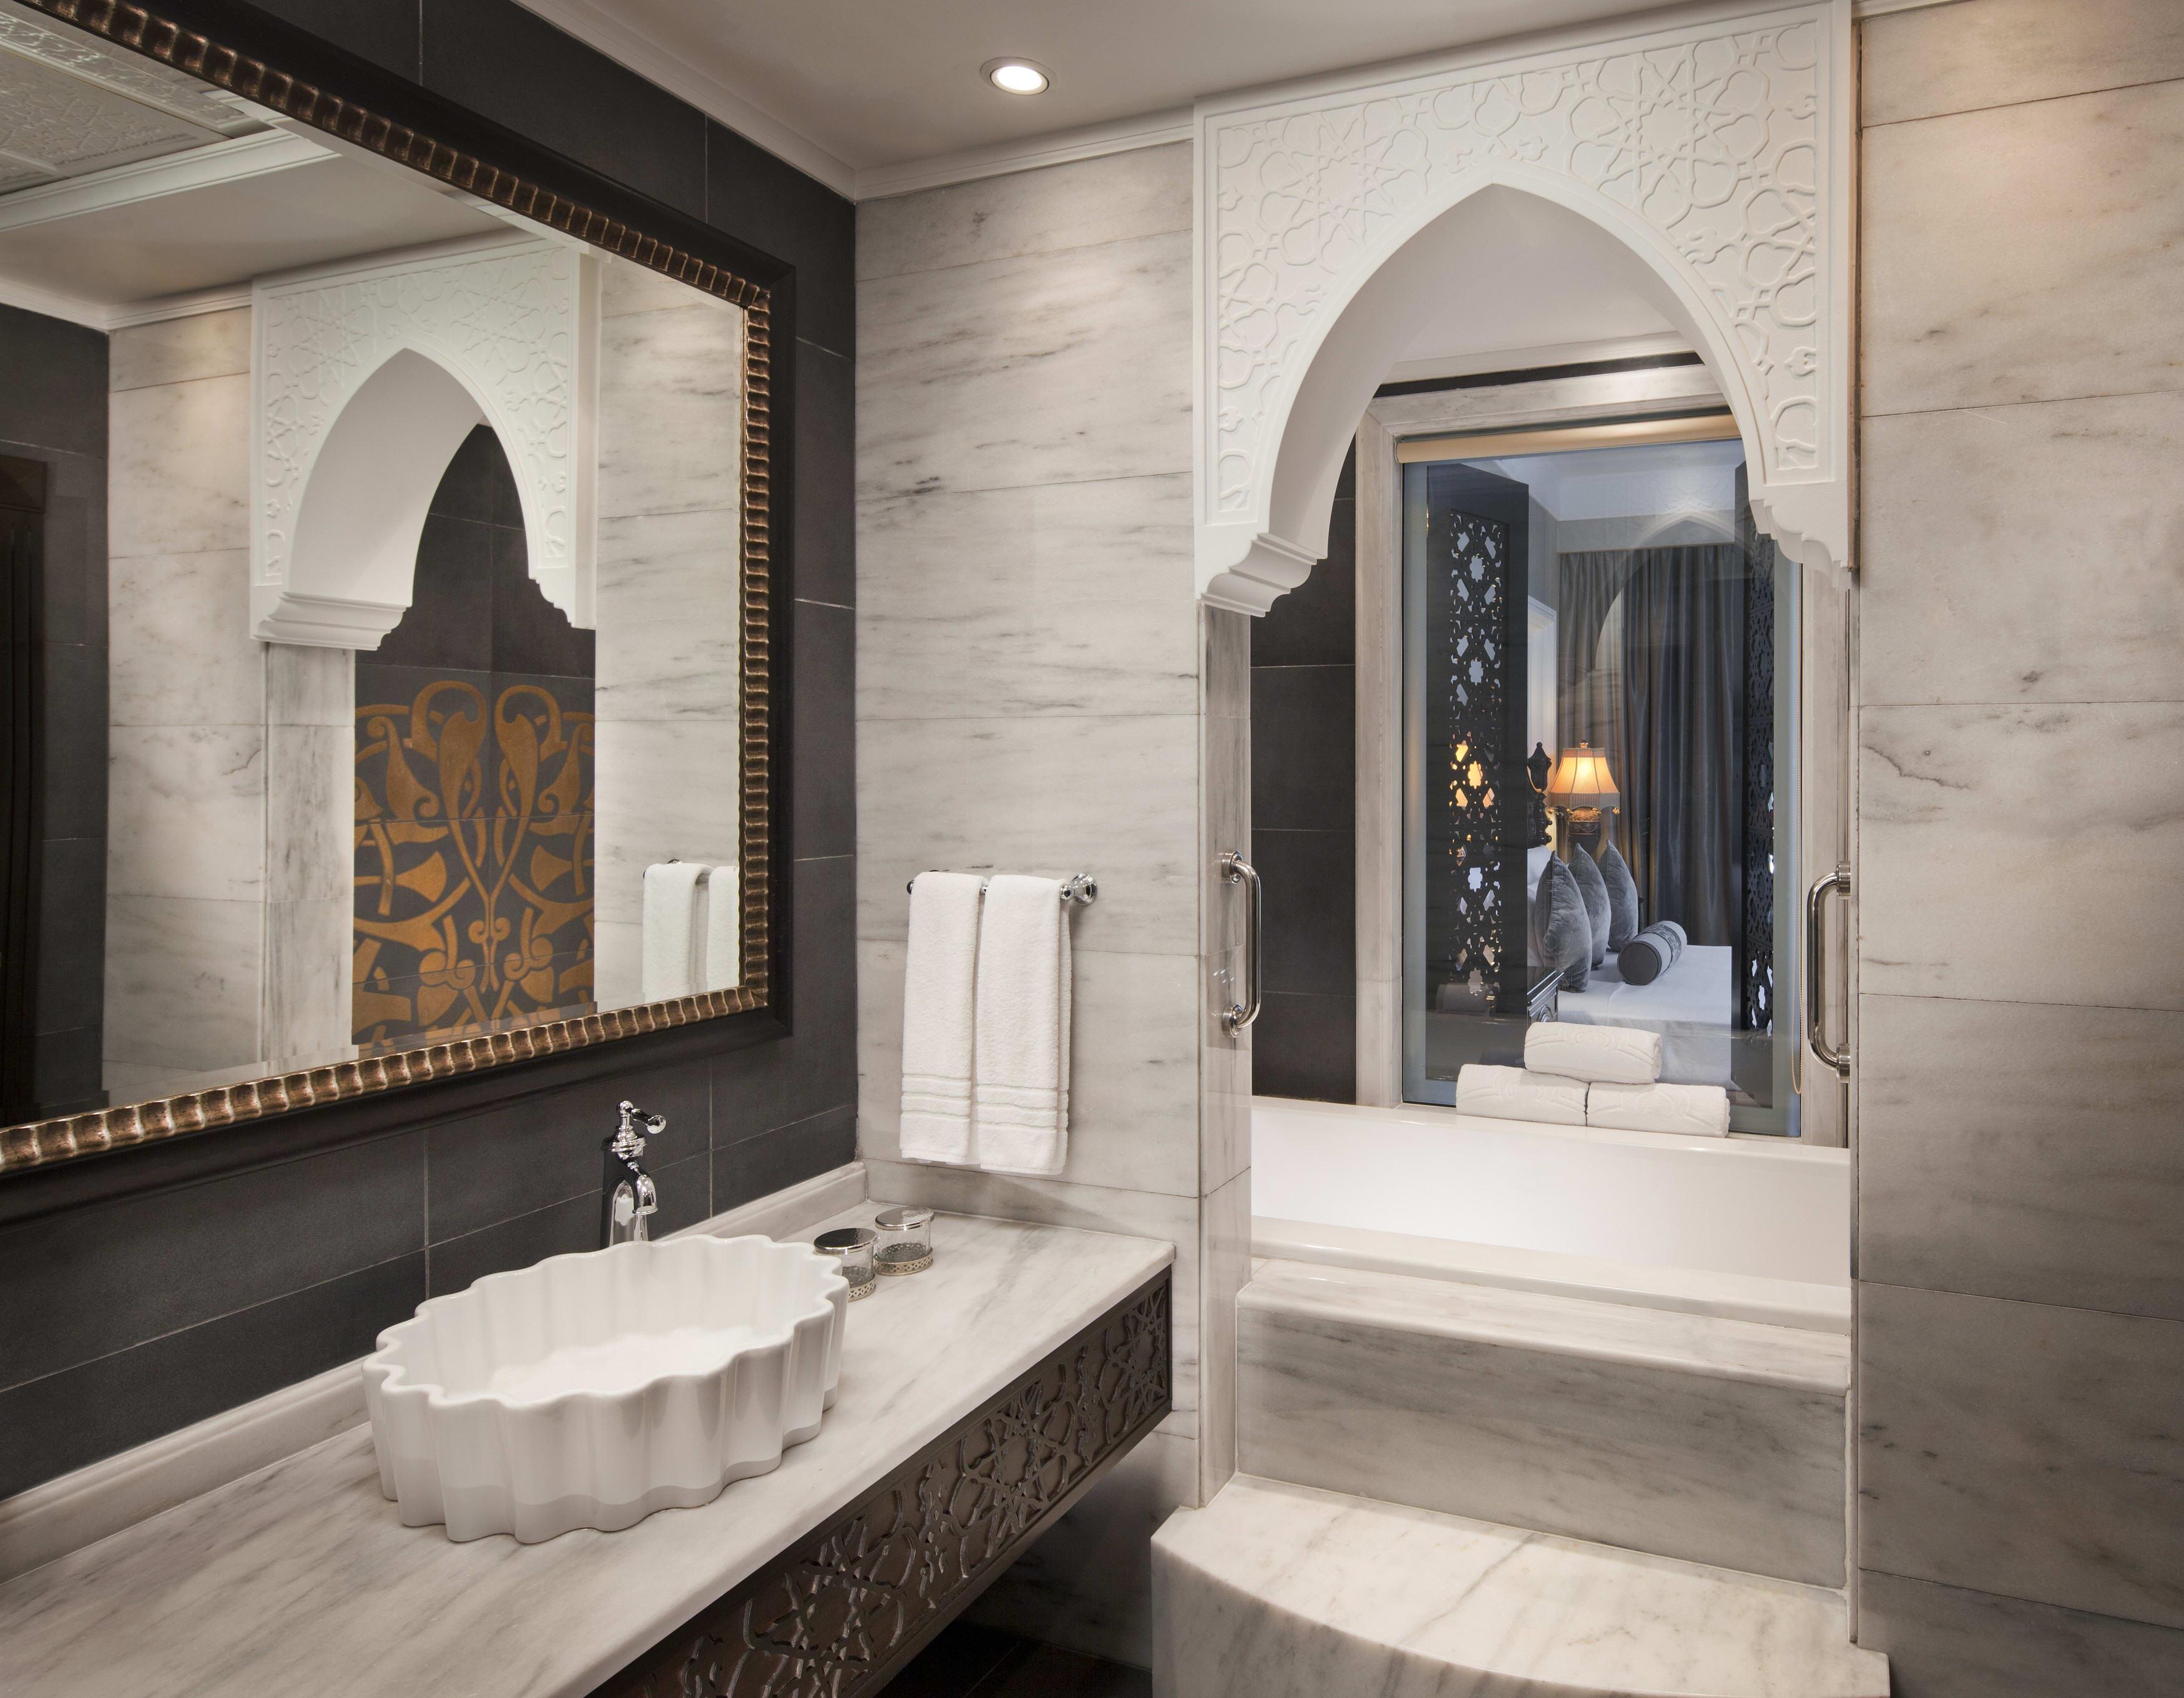 Jumeirah Zabeel Saray   Lagoon Royal Residences Bathroom